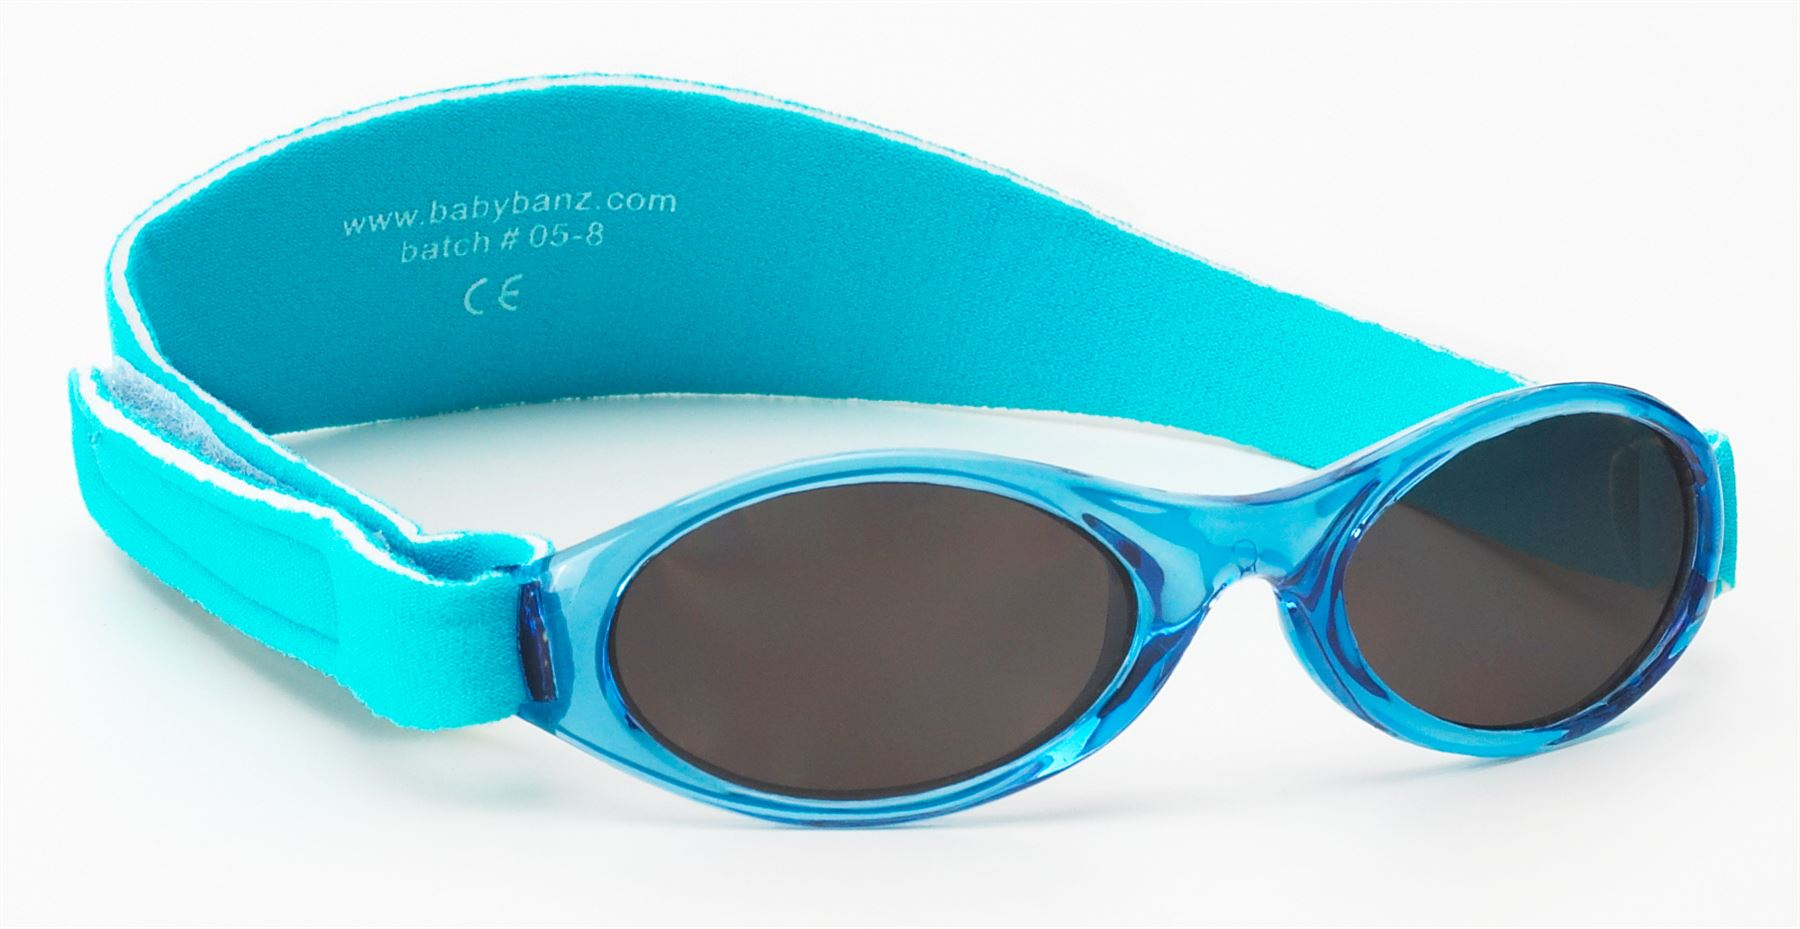 d572bd6e77580 Baby Banz Adventurer Sunglasses 100% UVA UVB Kids Toddler Sun Protection BN